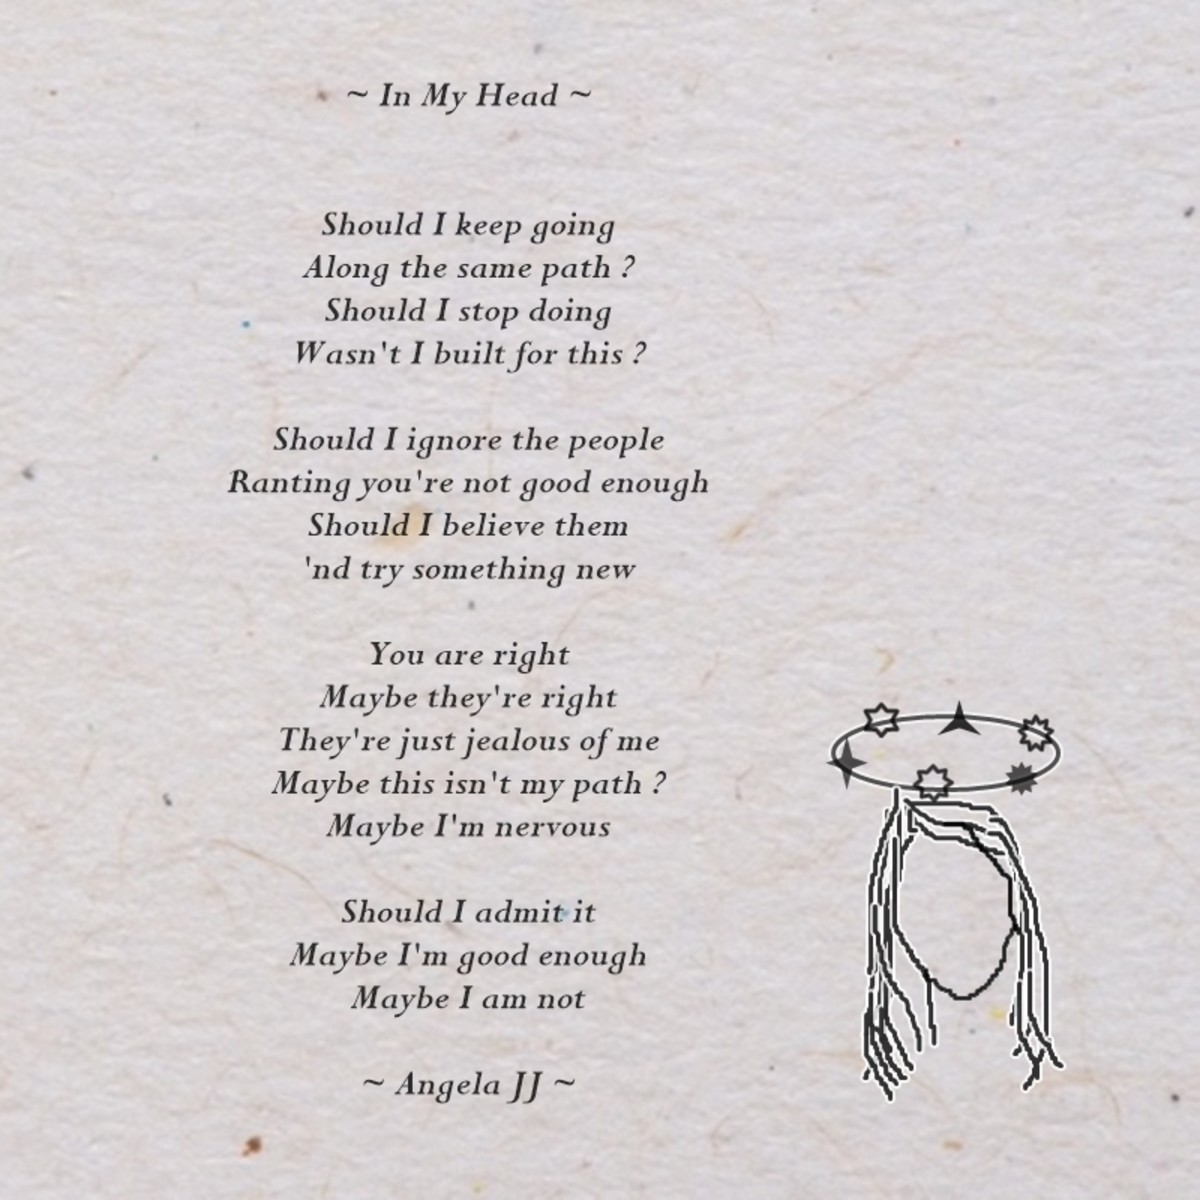 ~ In My Head poem ~